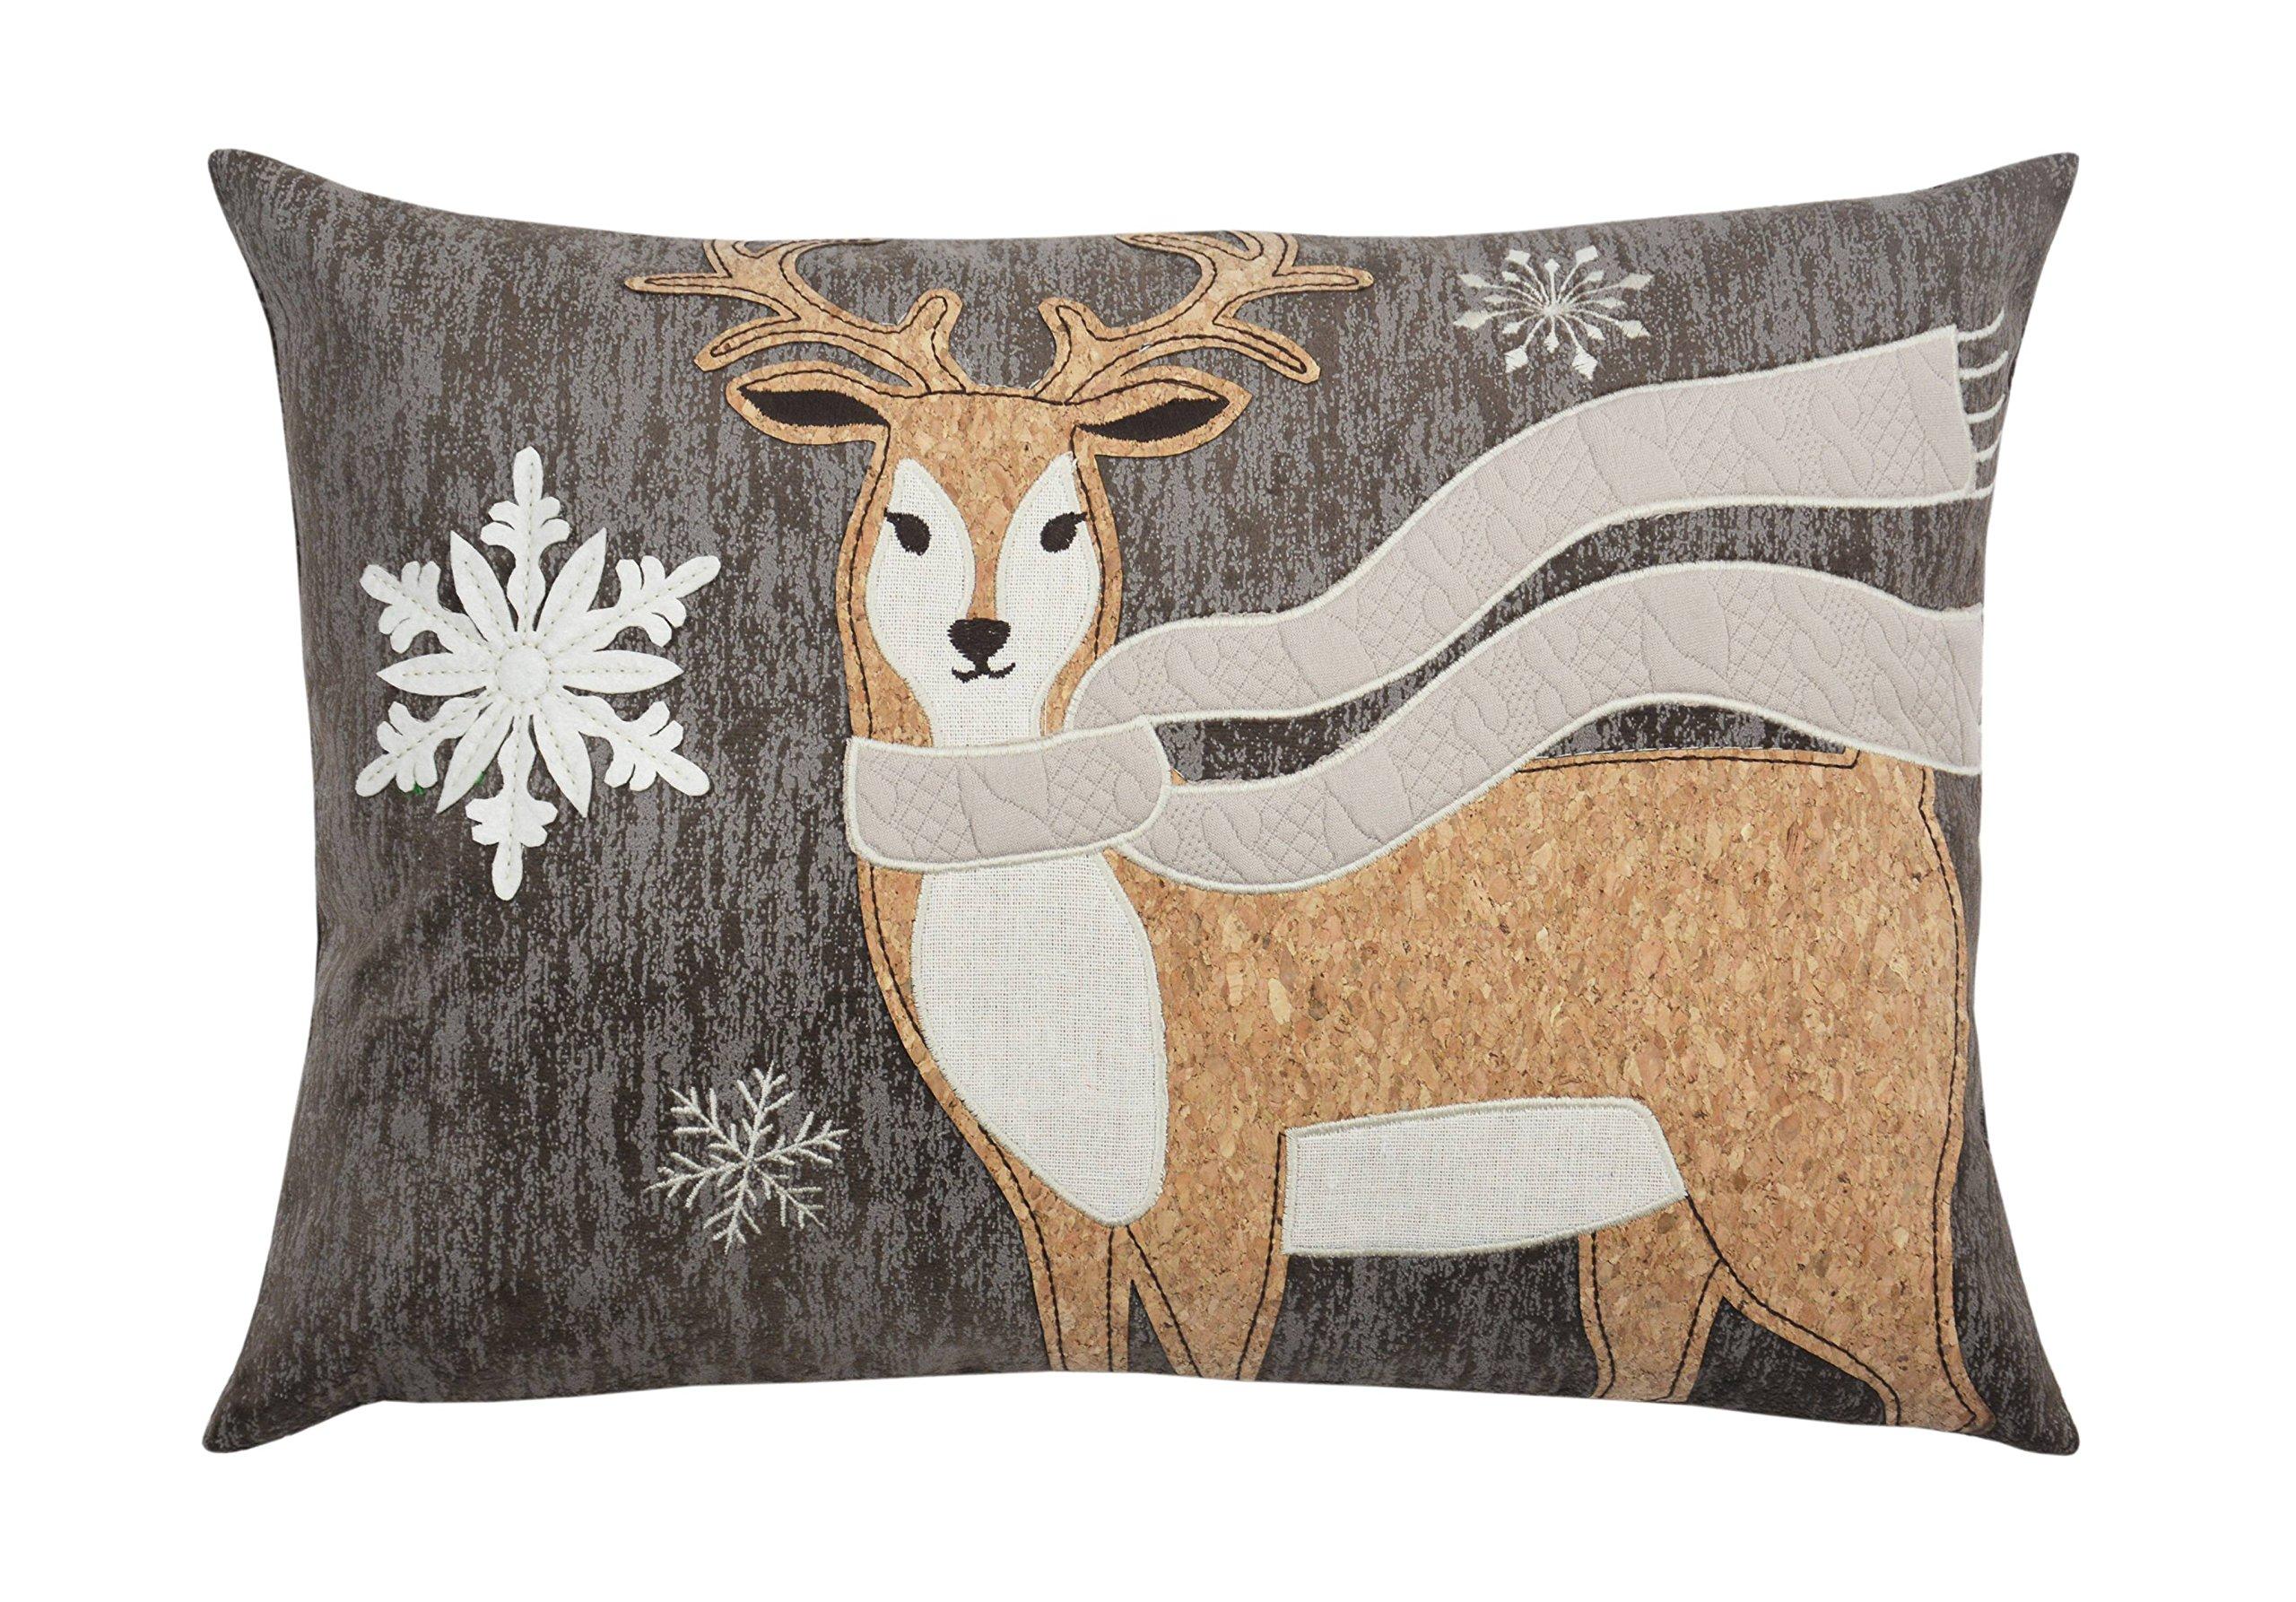 Comfy Hour 18''x13'' Wood Reindeer Accent Pillow Throw Pillow Decorative Cushion